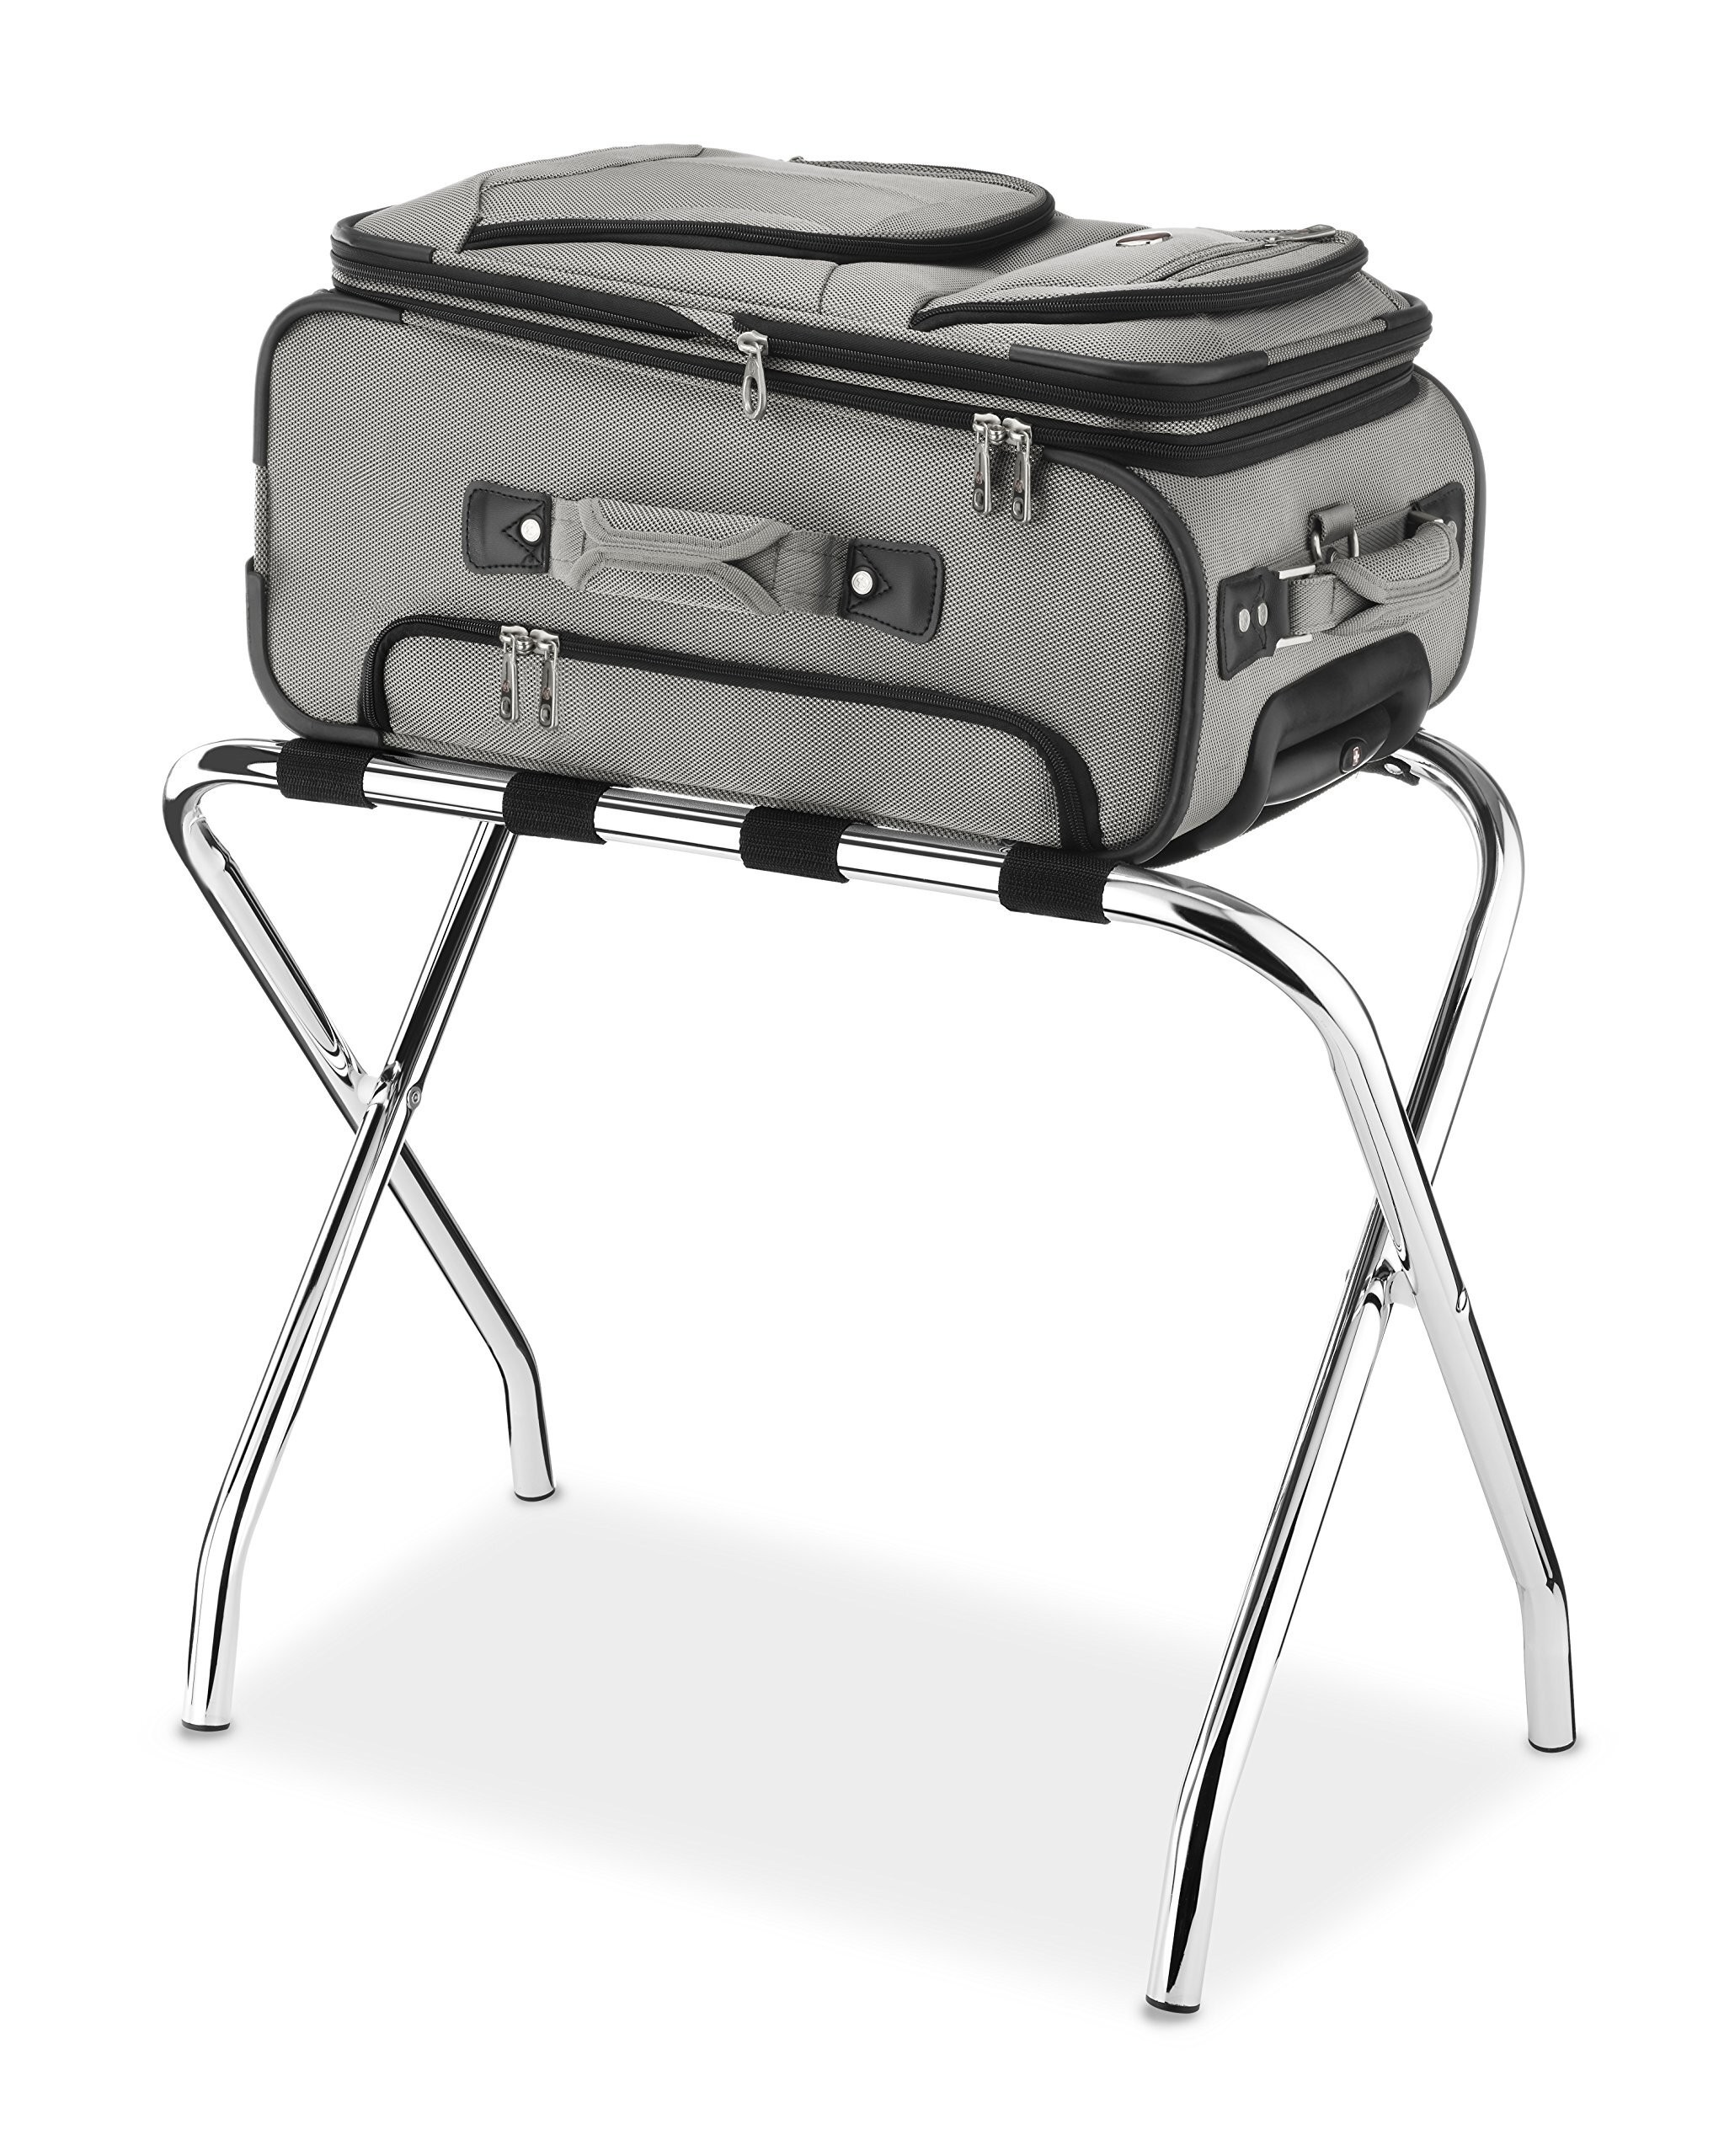 how to choose luggage racks foter